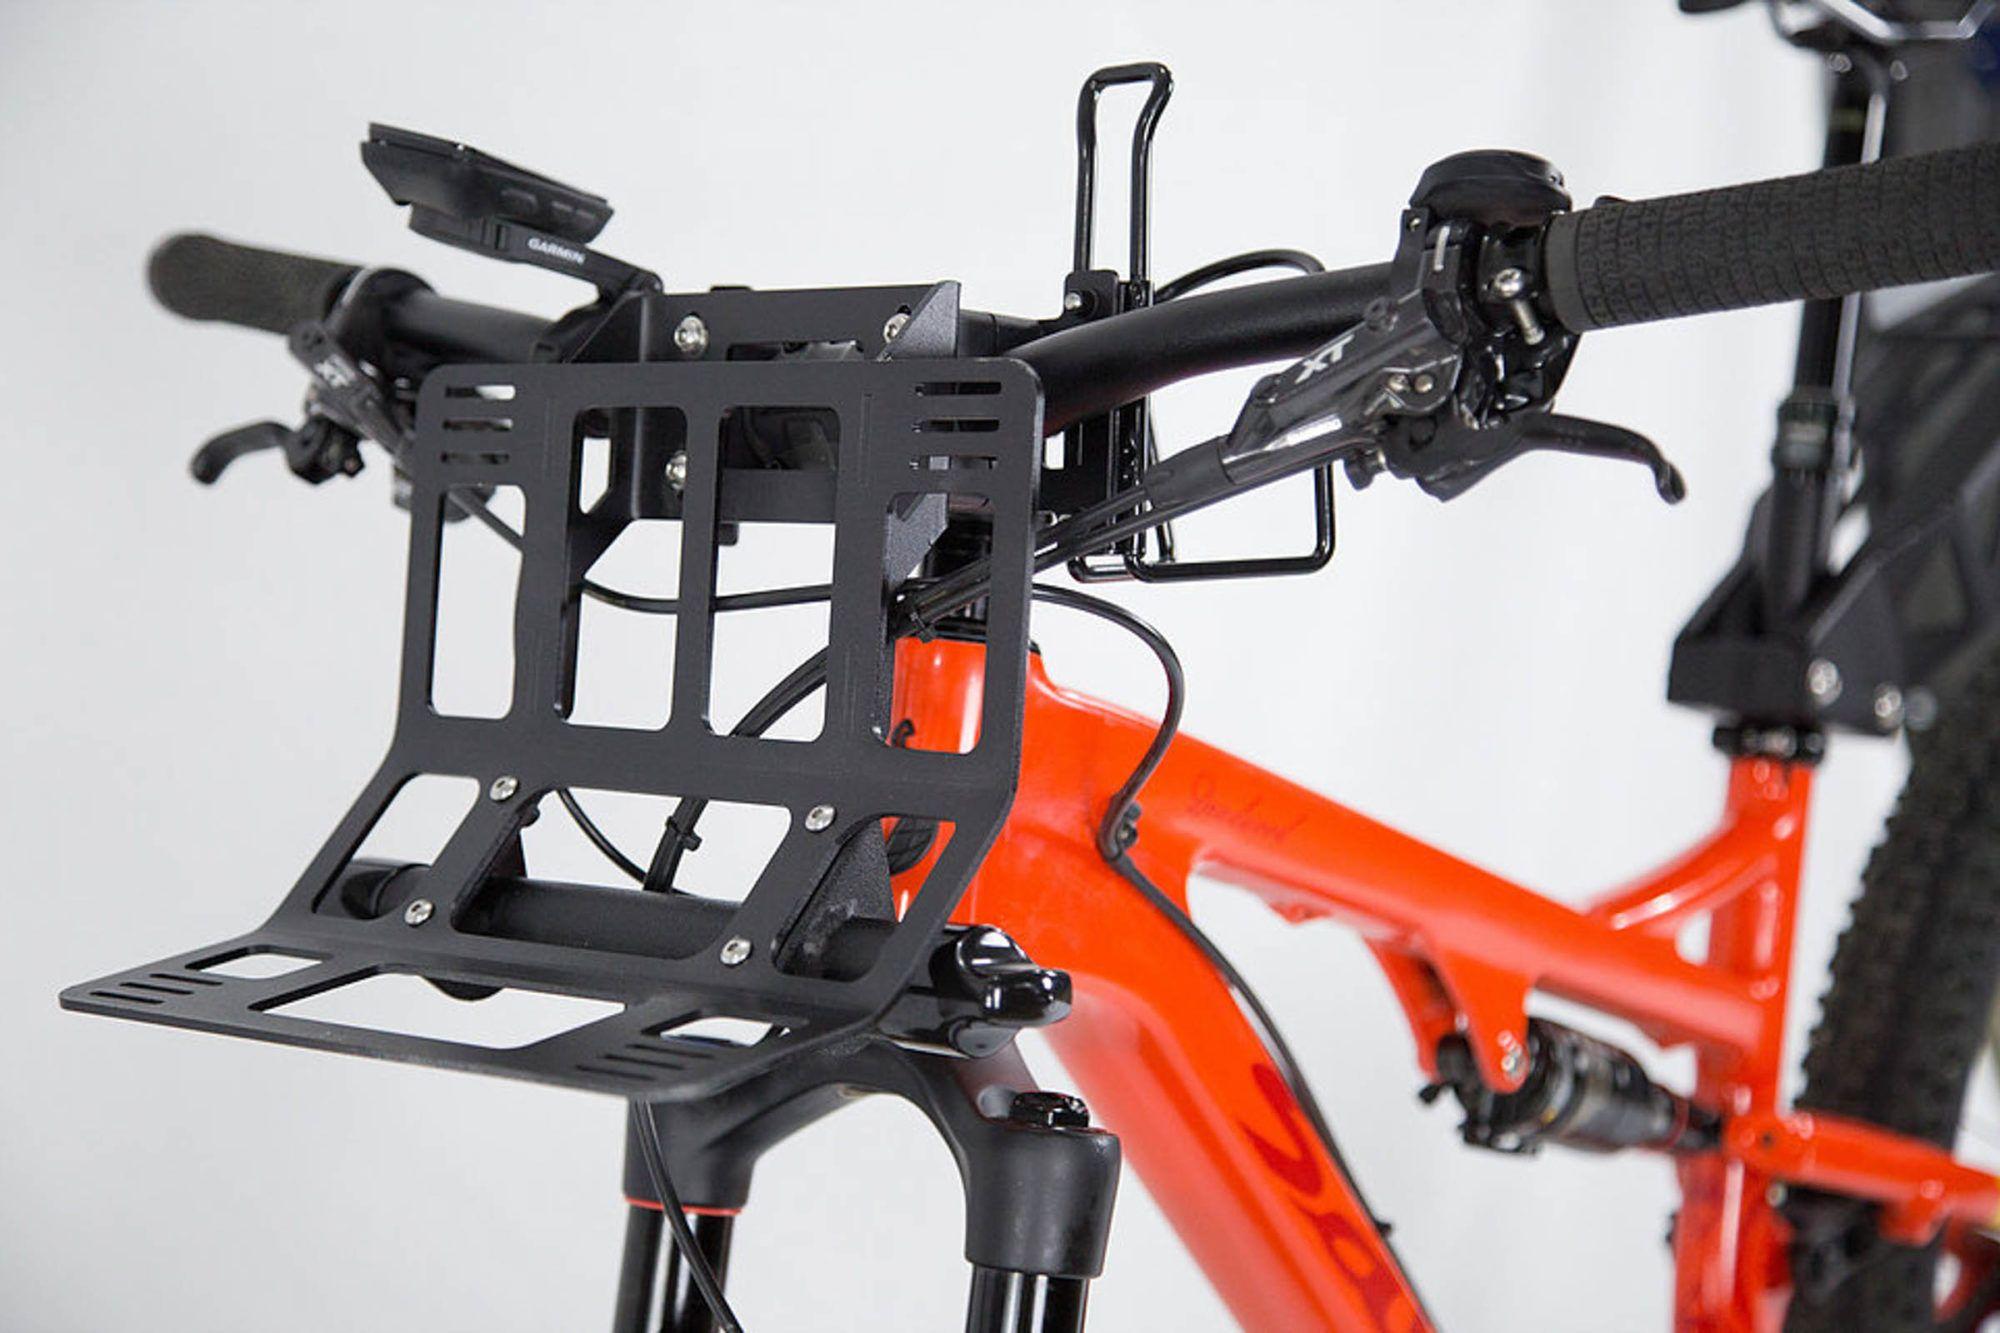 Overlander Bike Gear Made In Canada Bike Gear Bikepacking